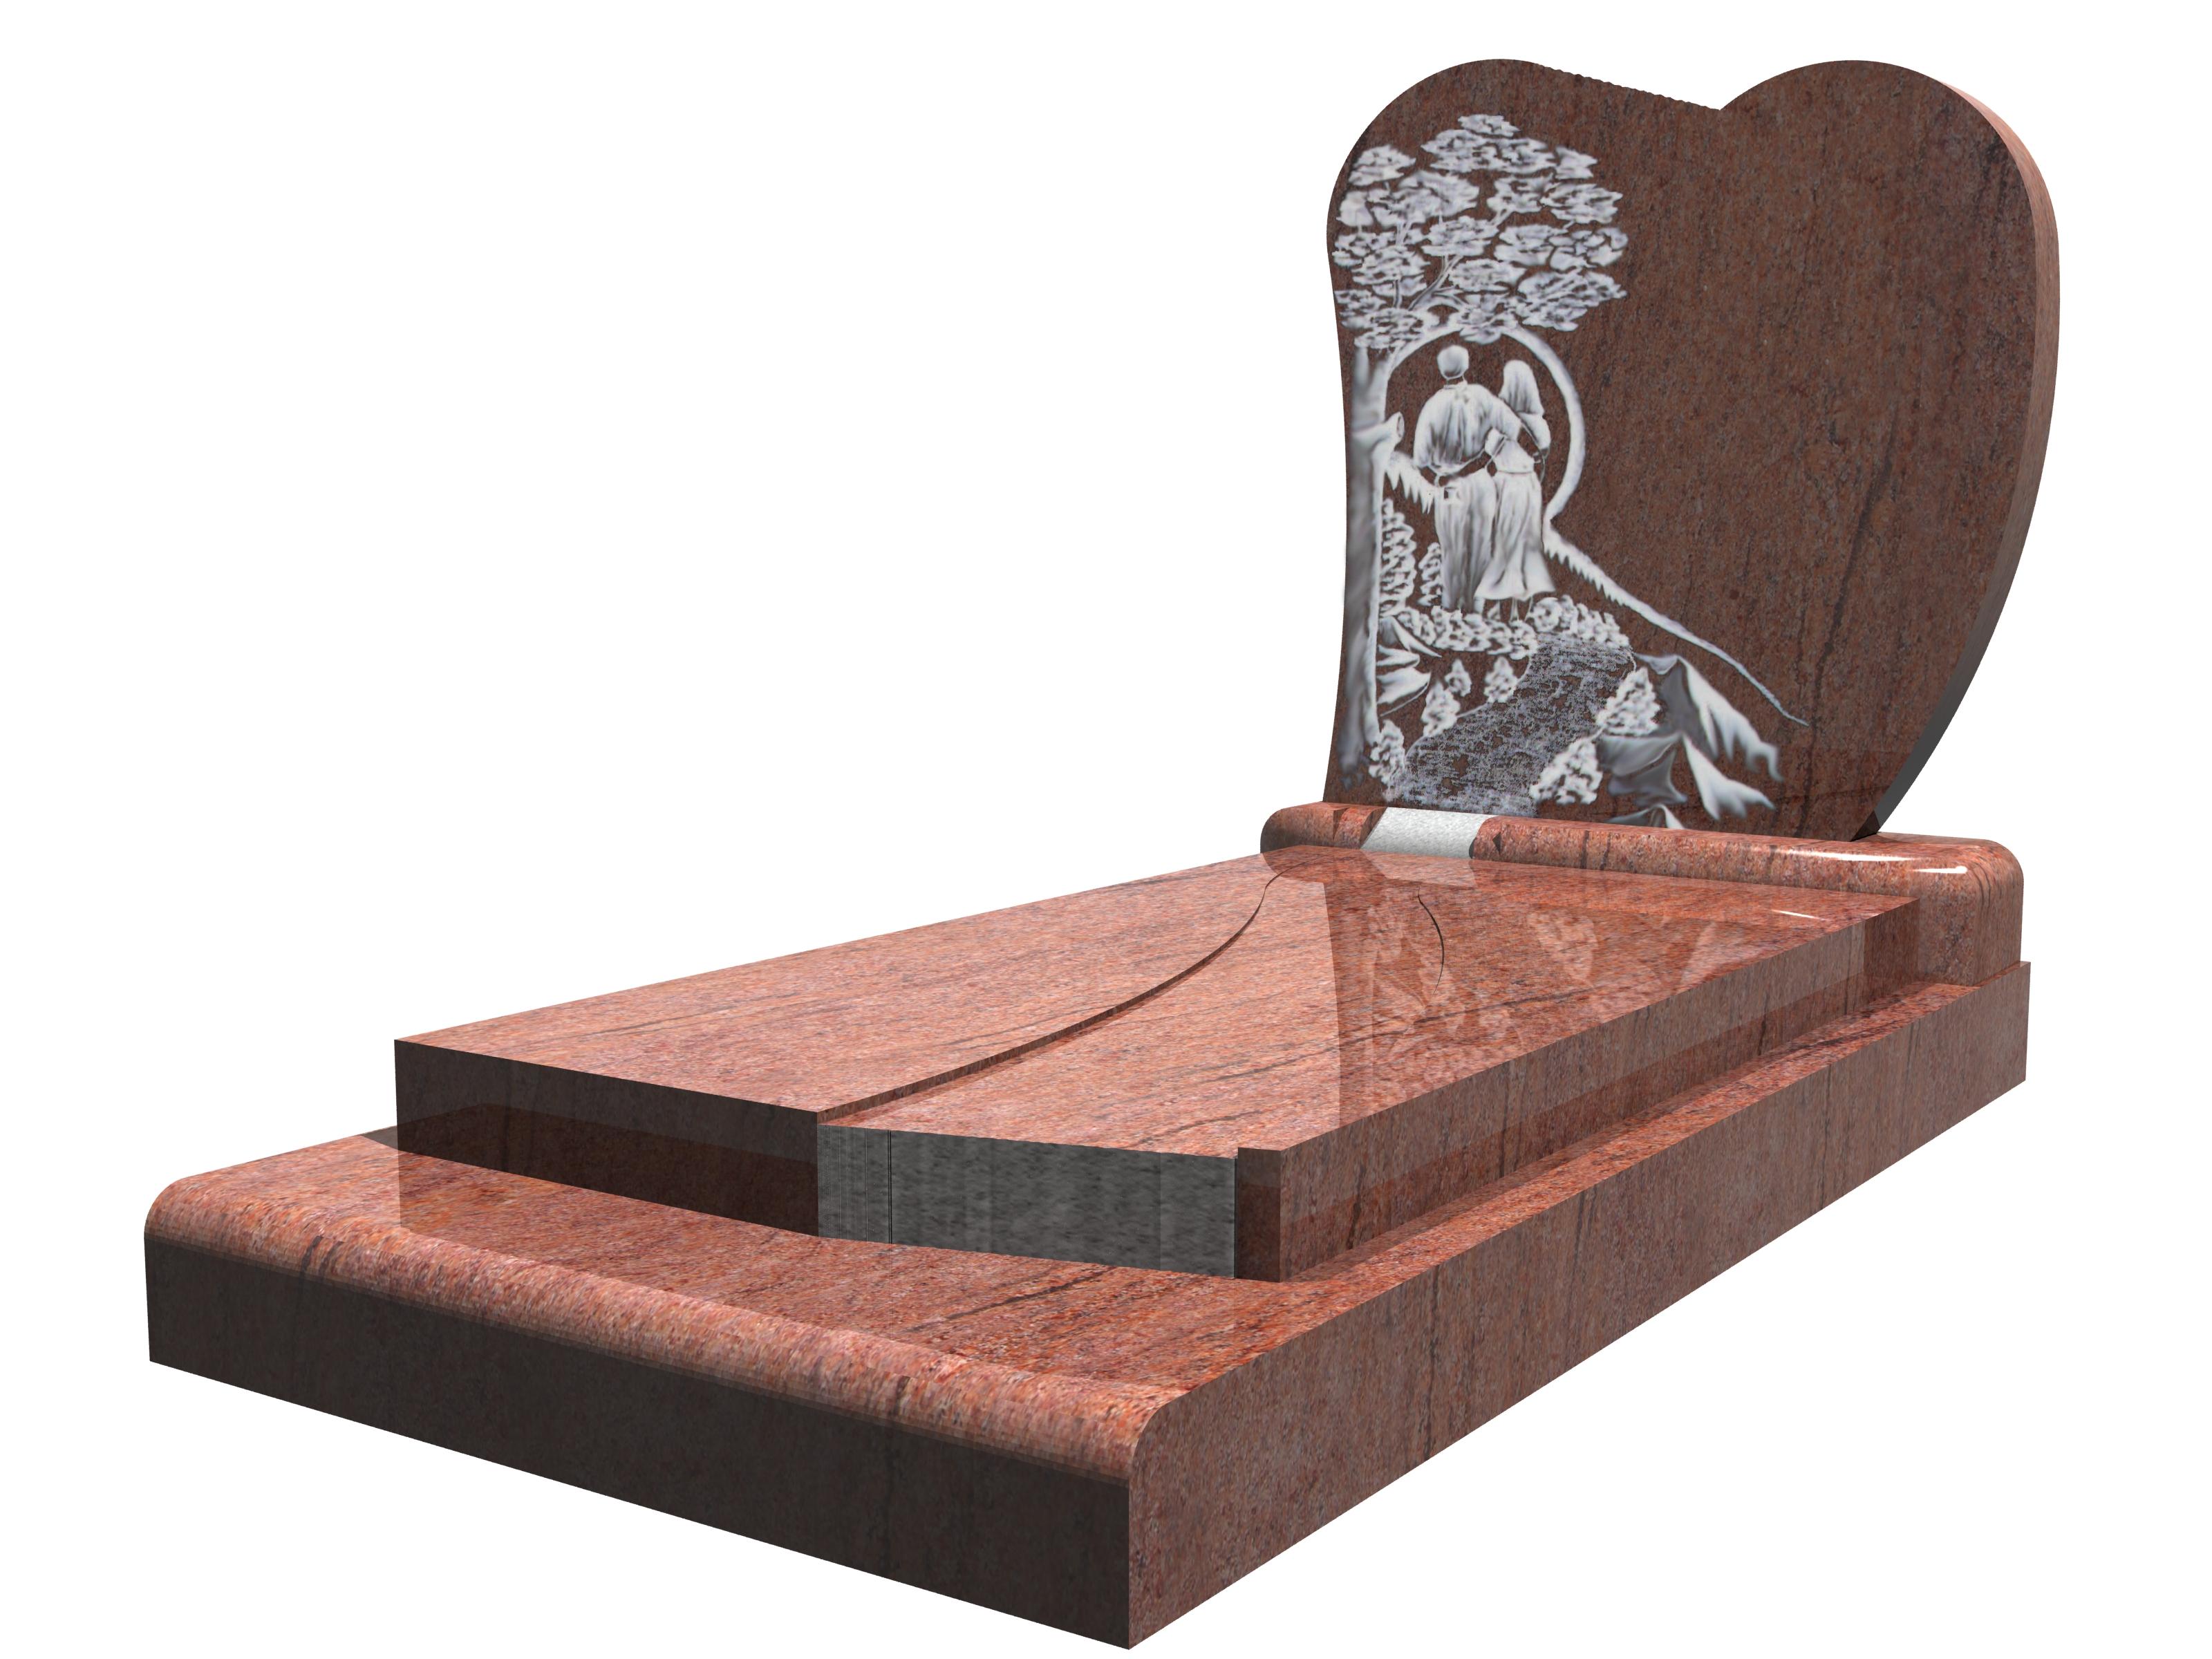 gravure tombe, gavure stèle, gravure nom defunt, gravure tombe funeraire